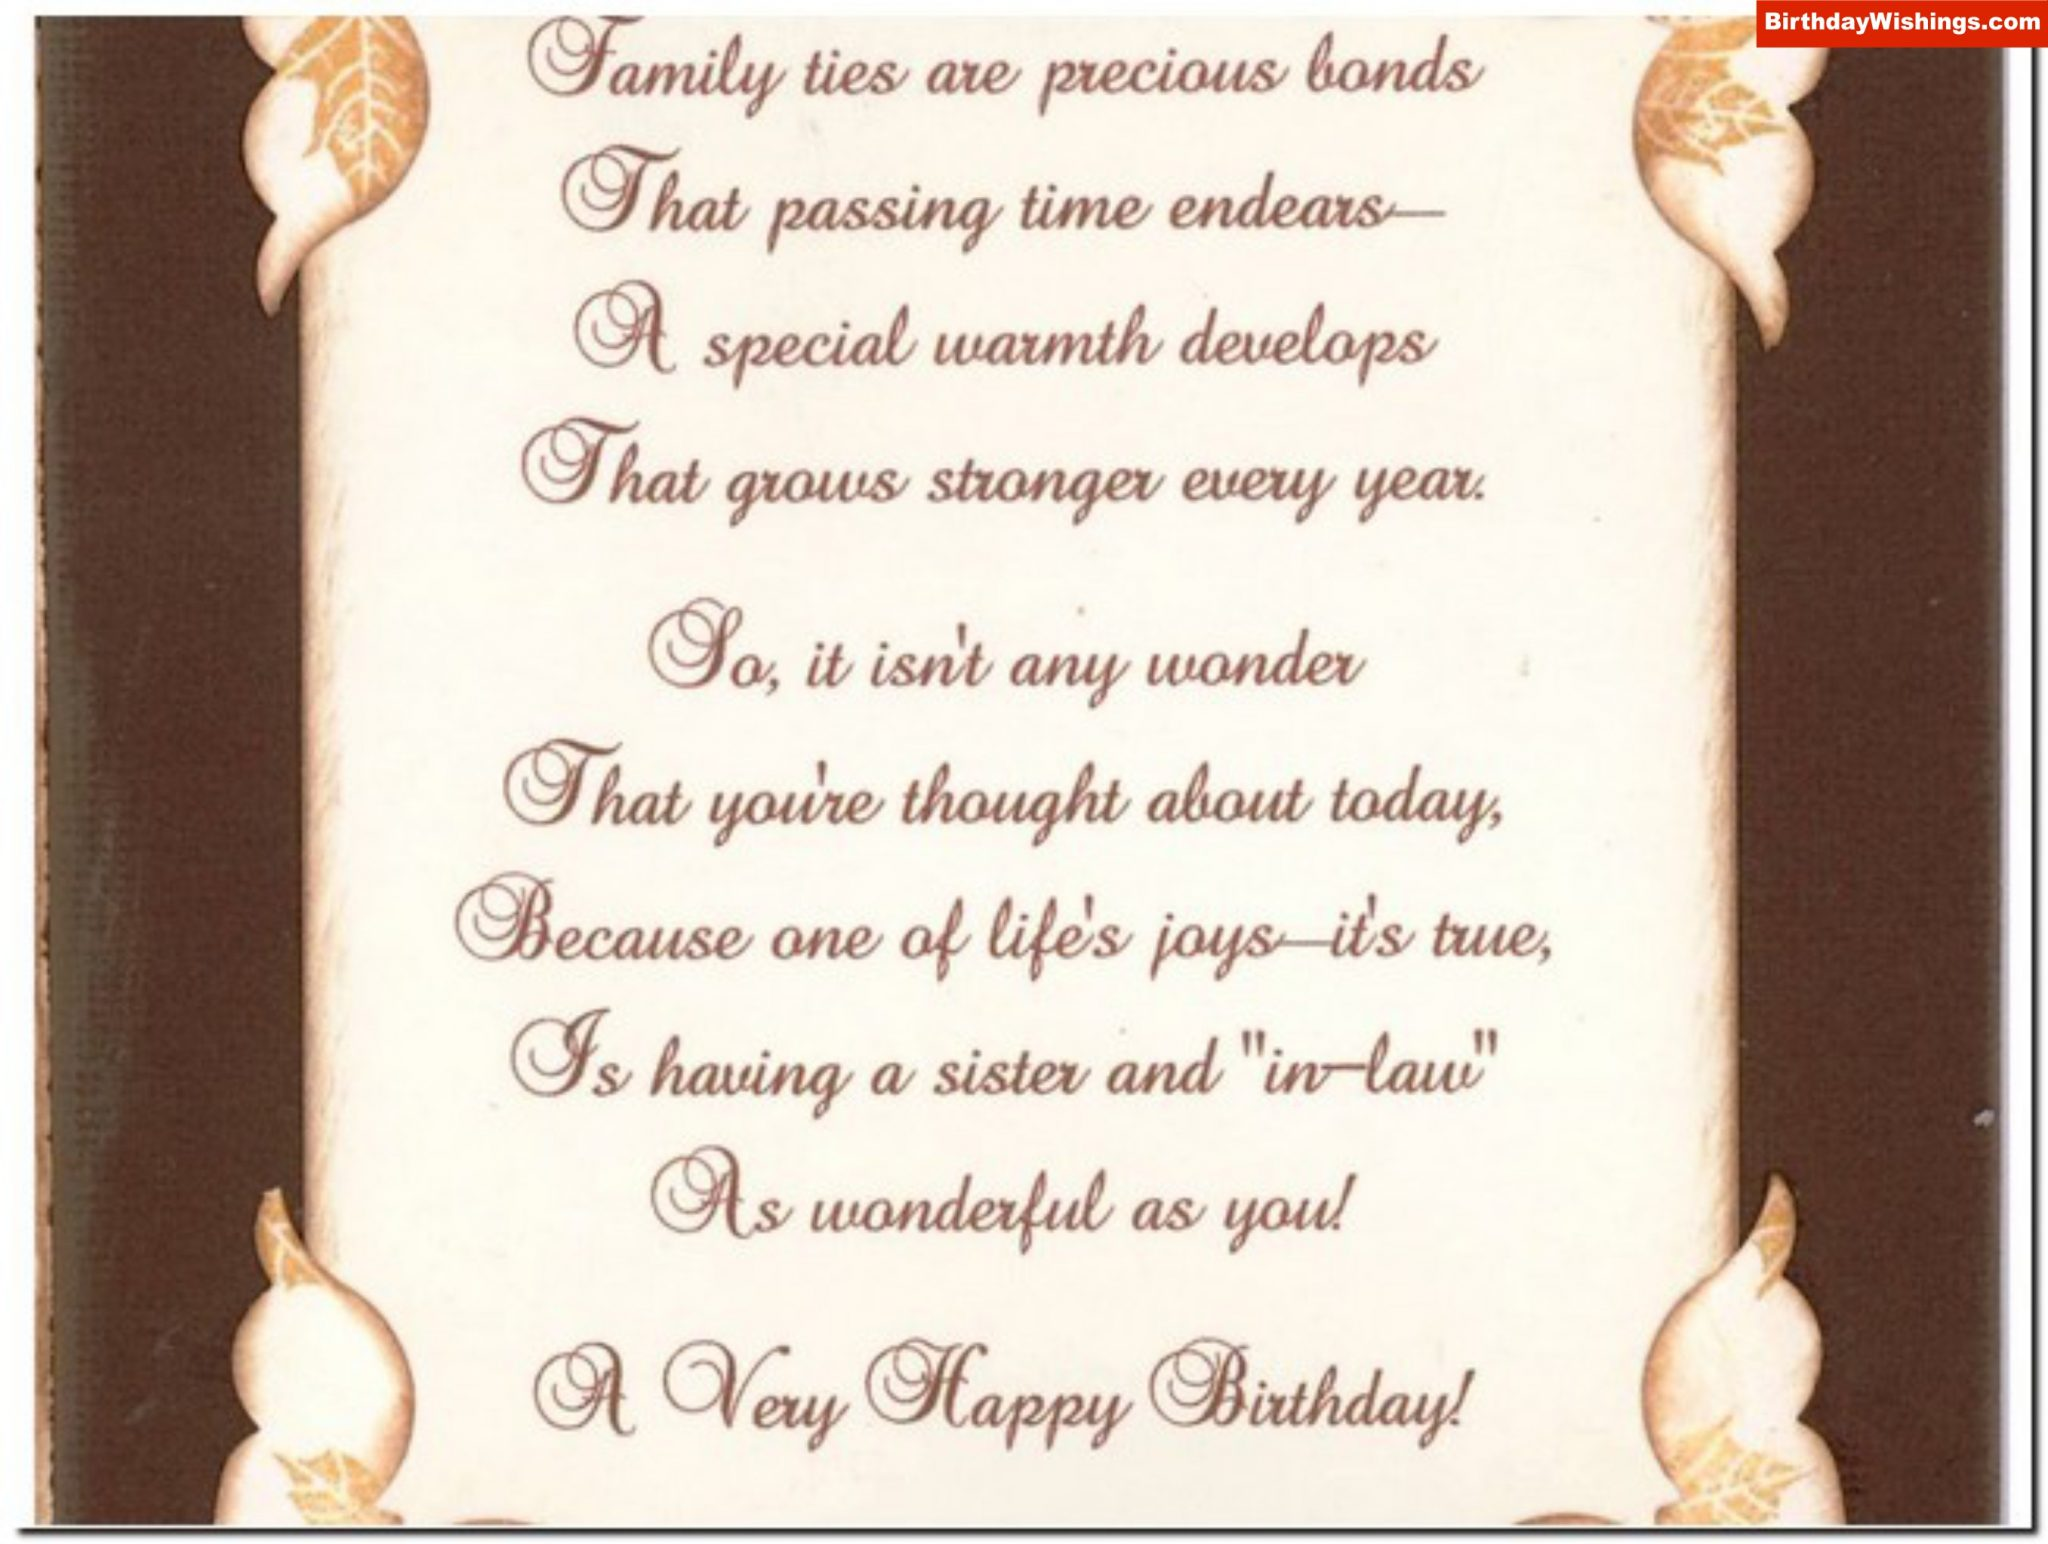 Birthday Poem For Sister In Law Birthdaywishings Com